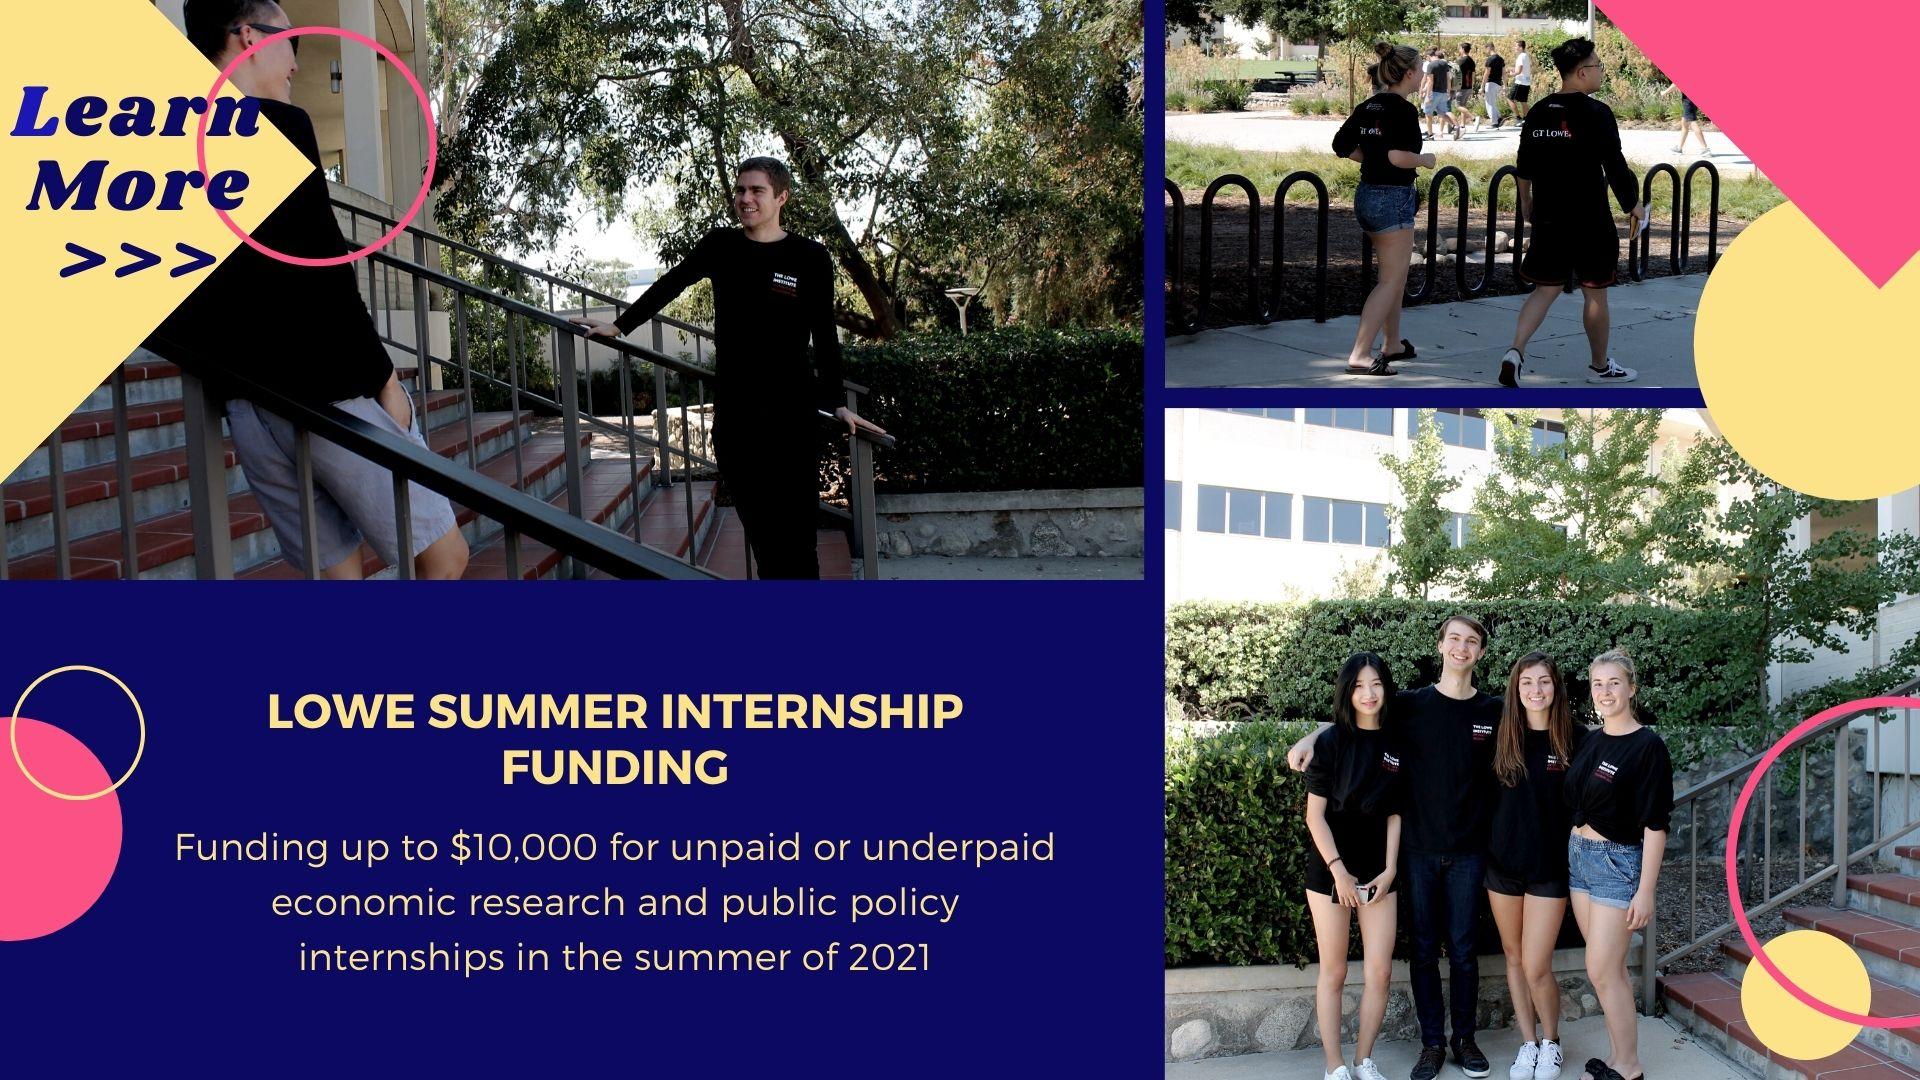 Lowe Summer Internship 2021